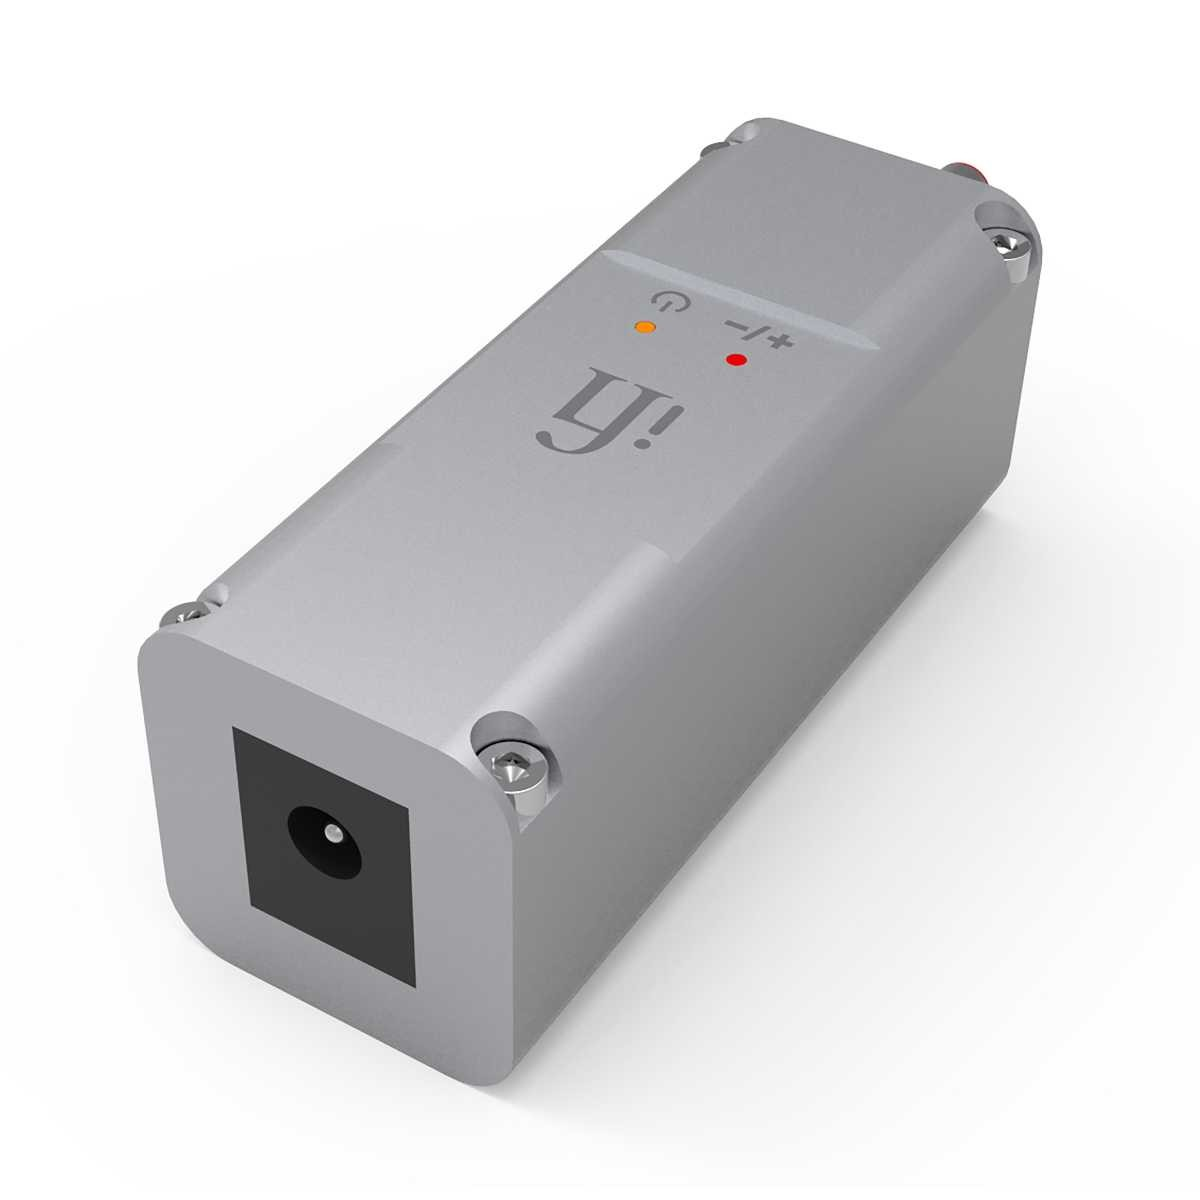 ifi Audio DC iPurifier 2 Filter AC Adapter 5V-24V / 3.5A / 84W